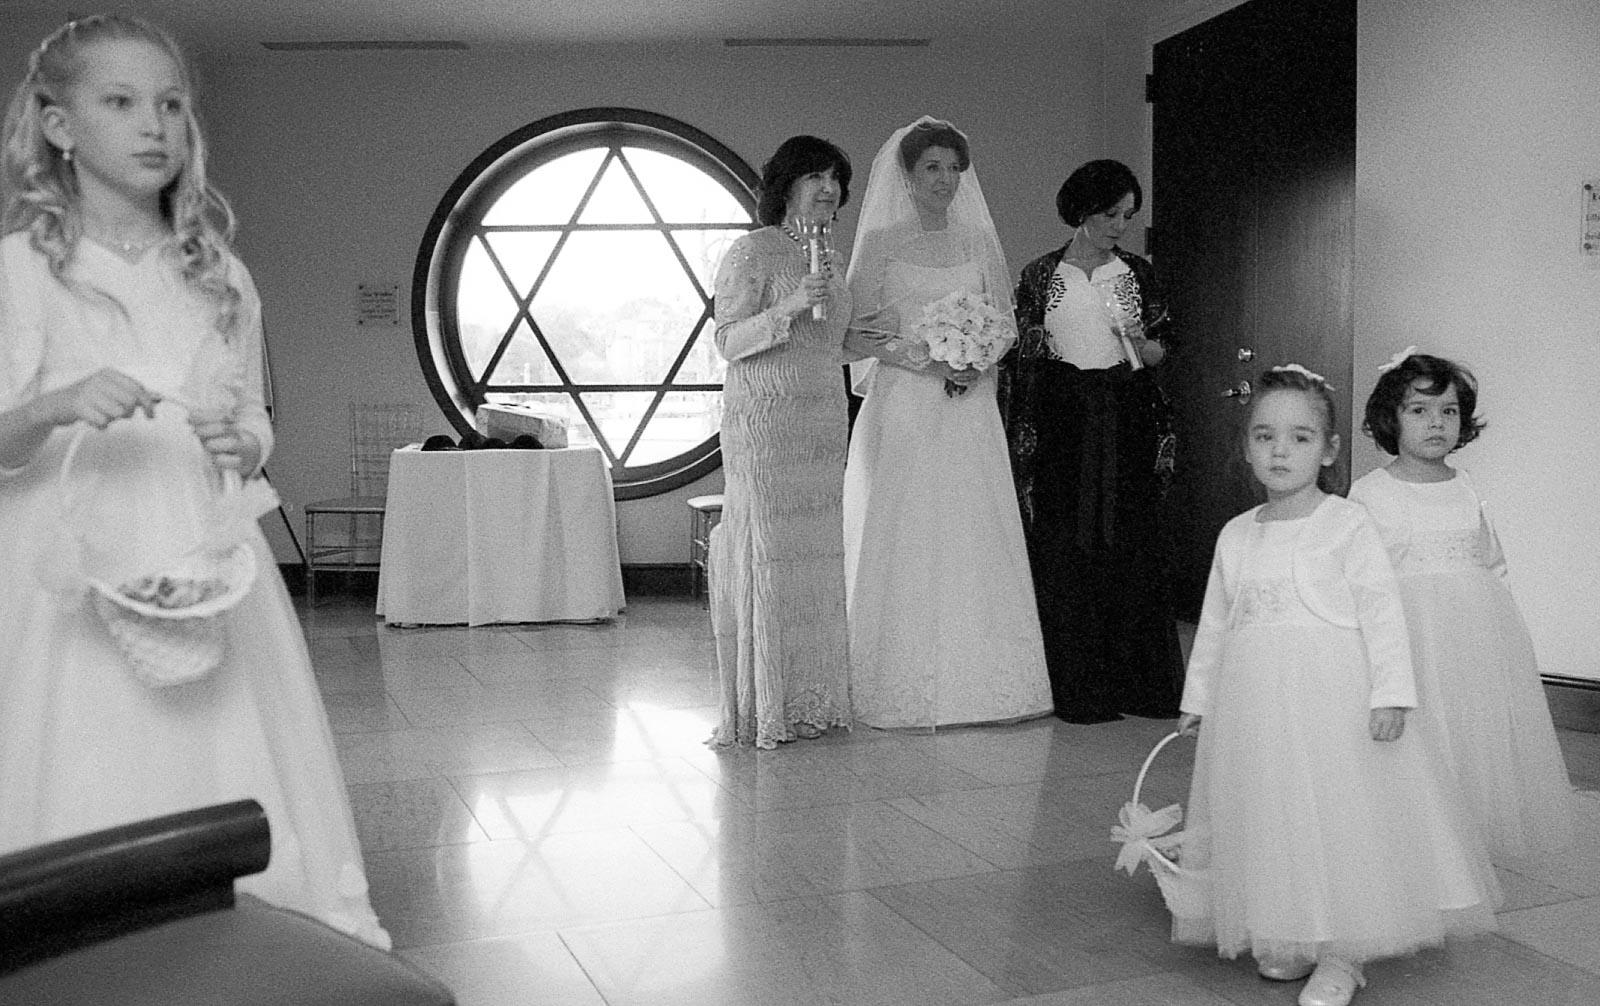 NYC-Hasidic-Jewish-Wedding-Jacek-Dolata-2.jpg